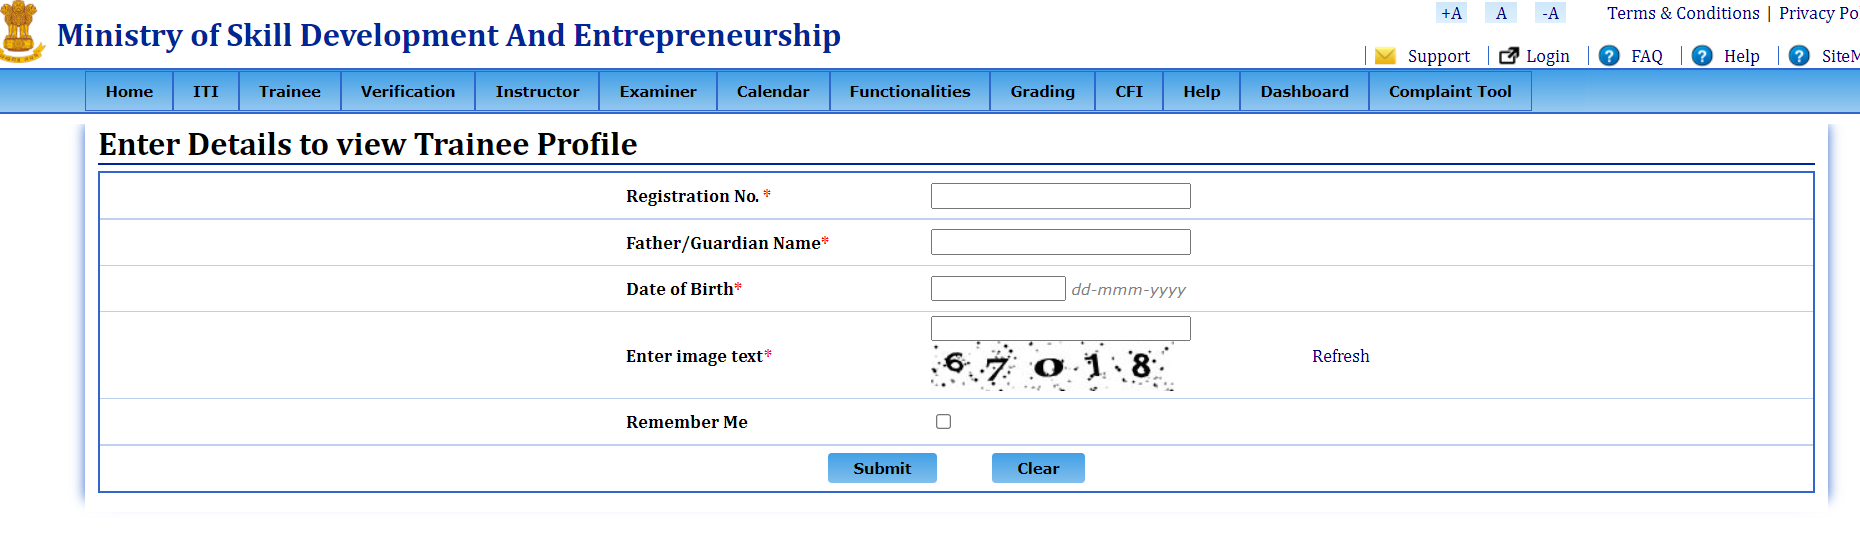 Exam Date 03 09 2021 onwards Download NCVT MIS Admit Card